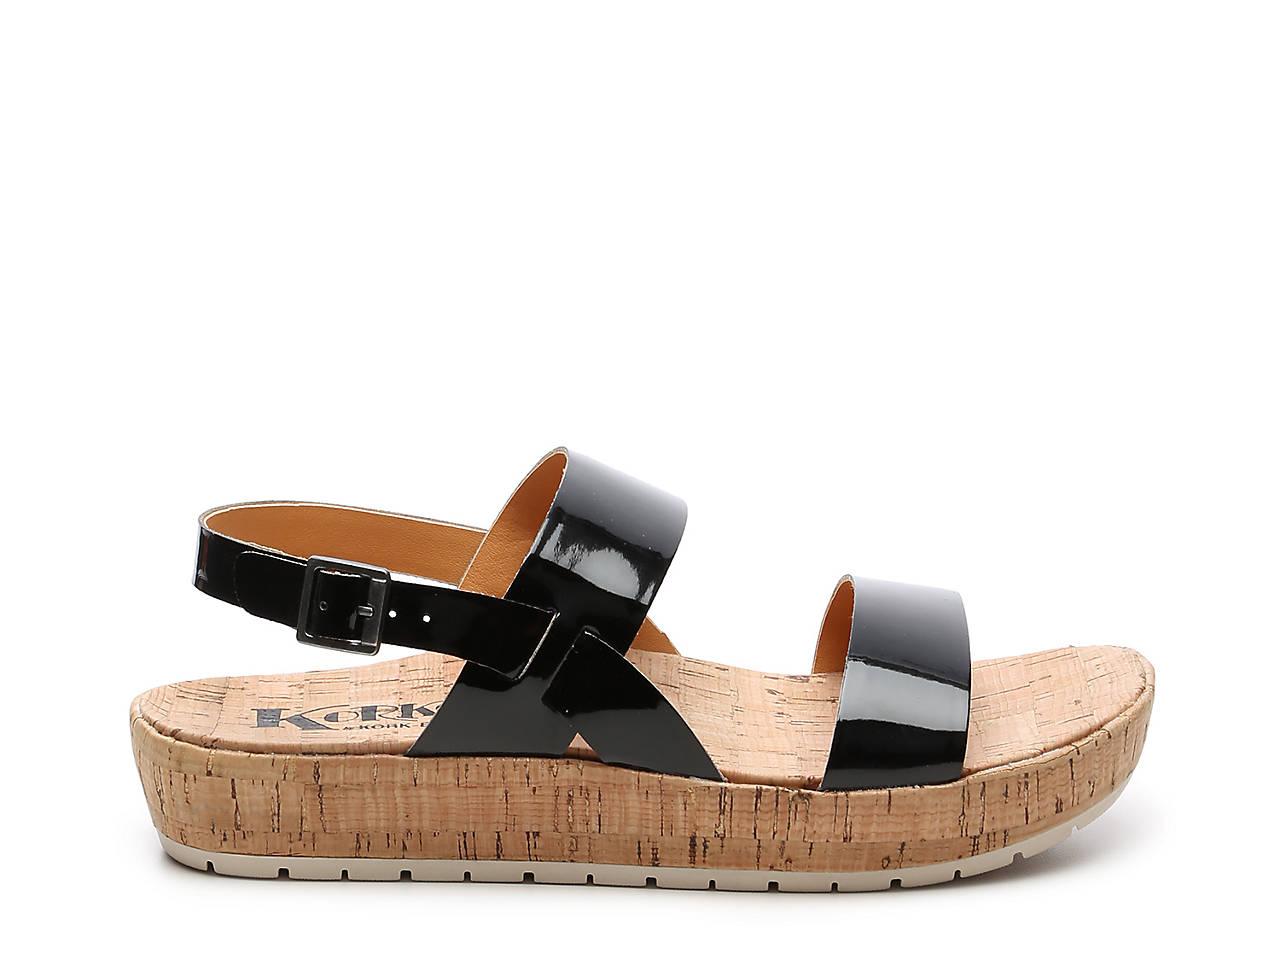 639ccd184e8 Korks Janine Sandal Women s Shoes